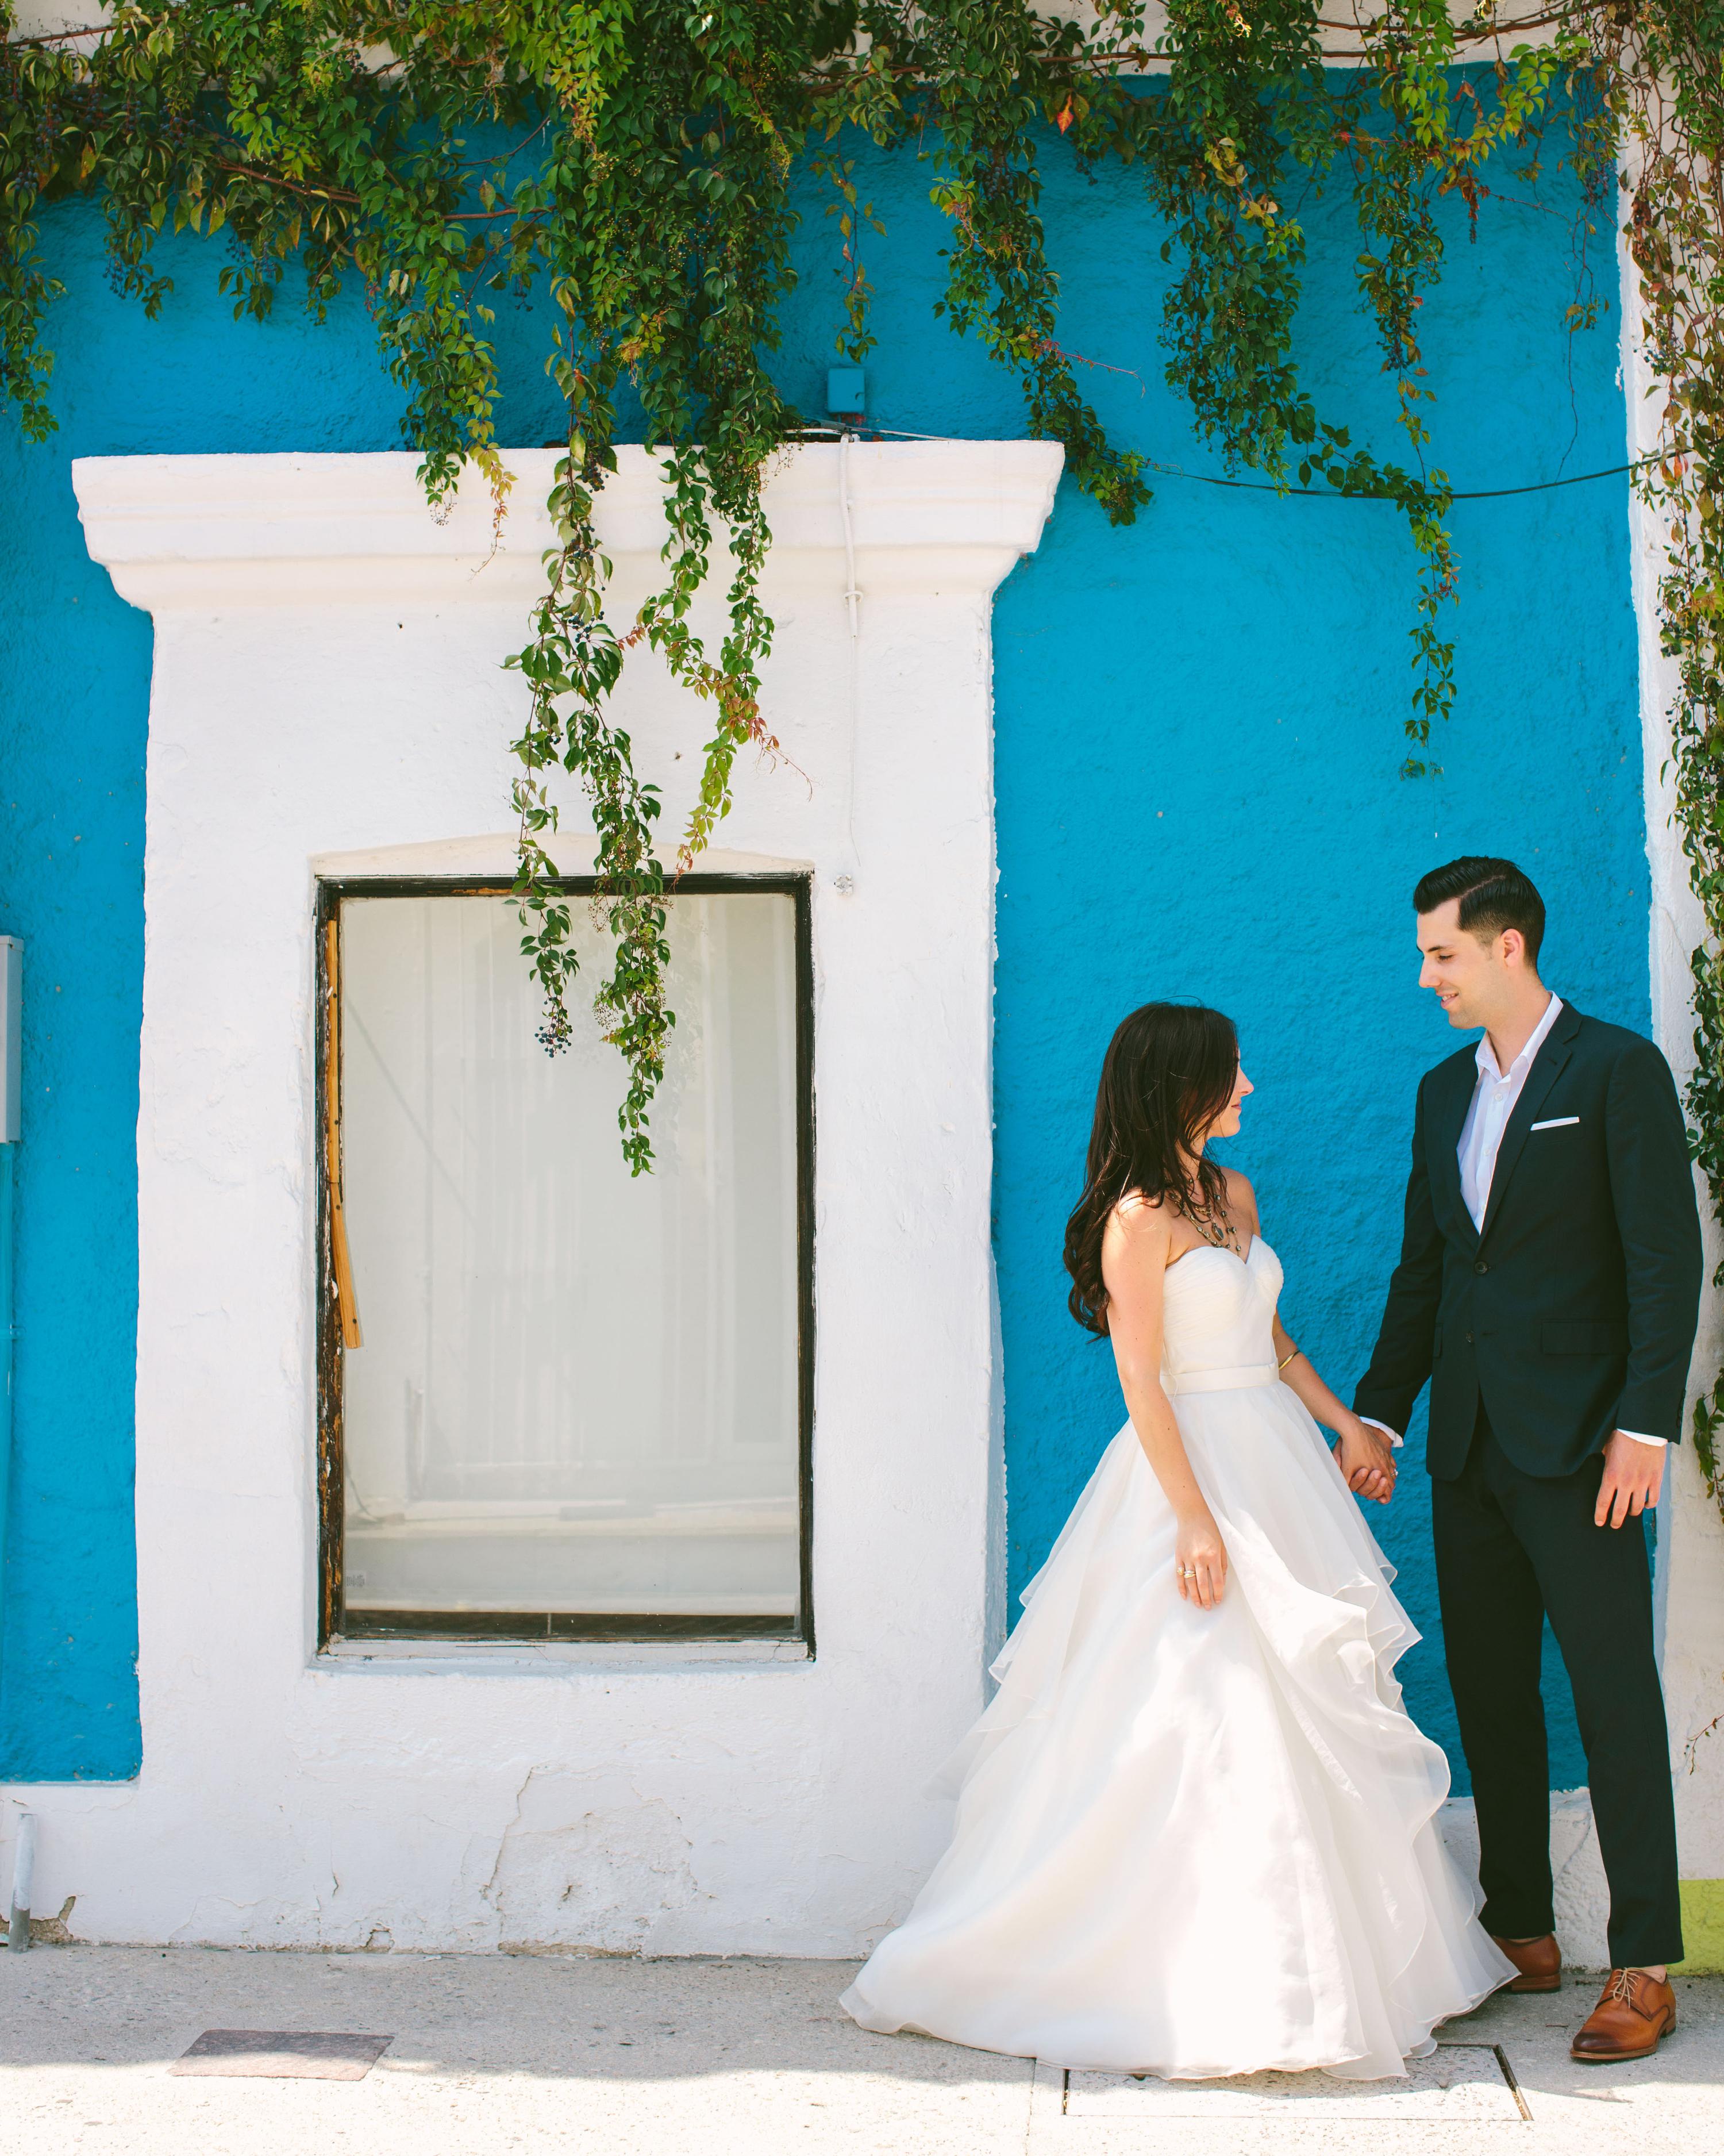 ali-jess-wedding-couple-229-002-s111717-1214.jpg